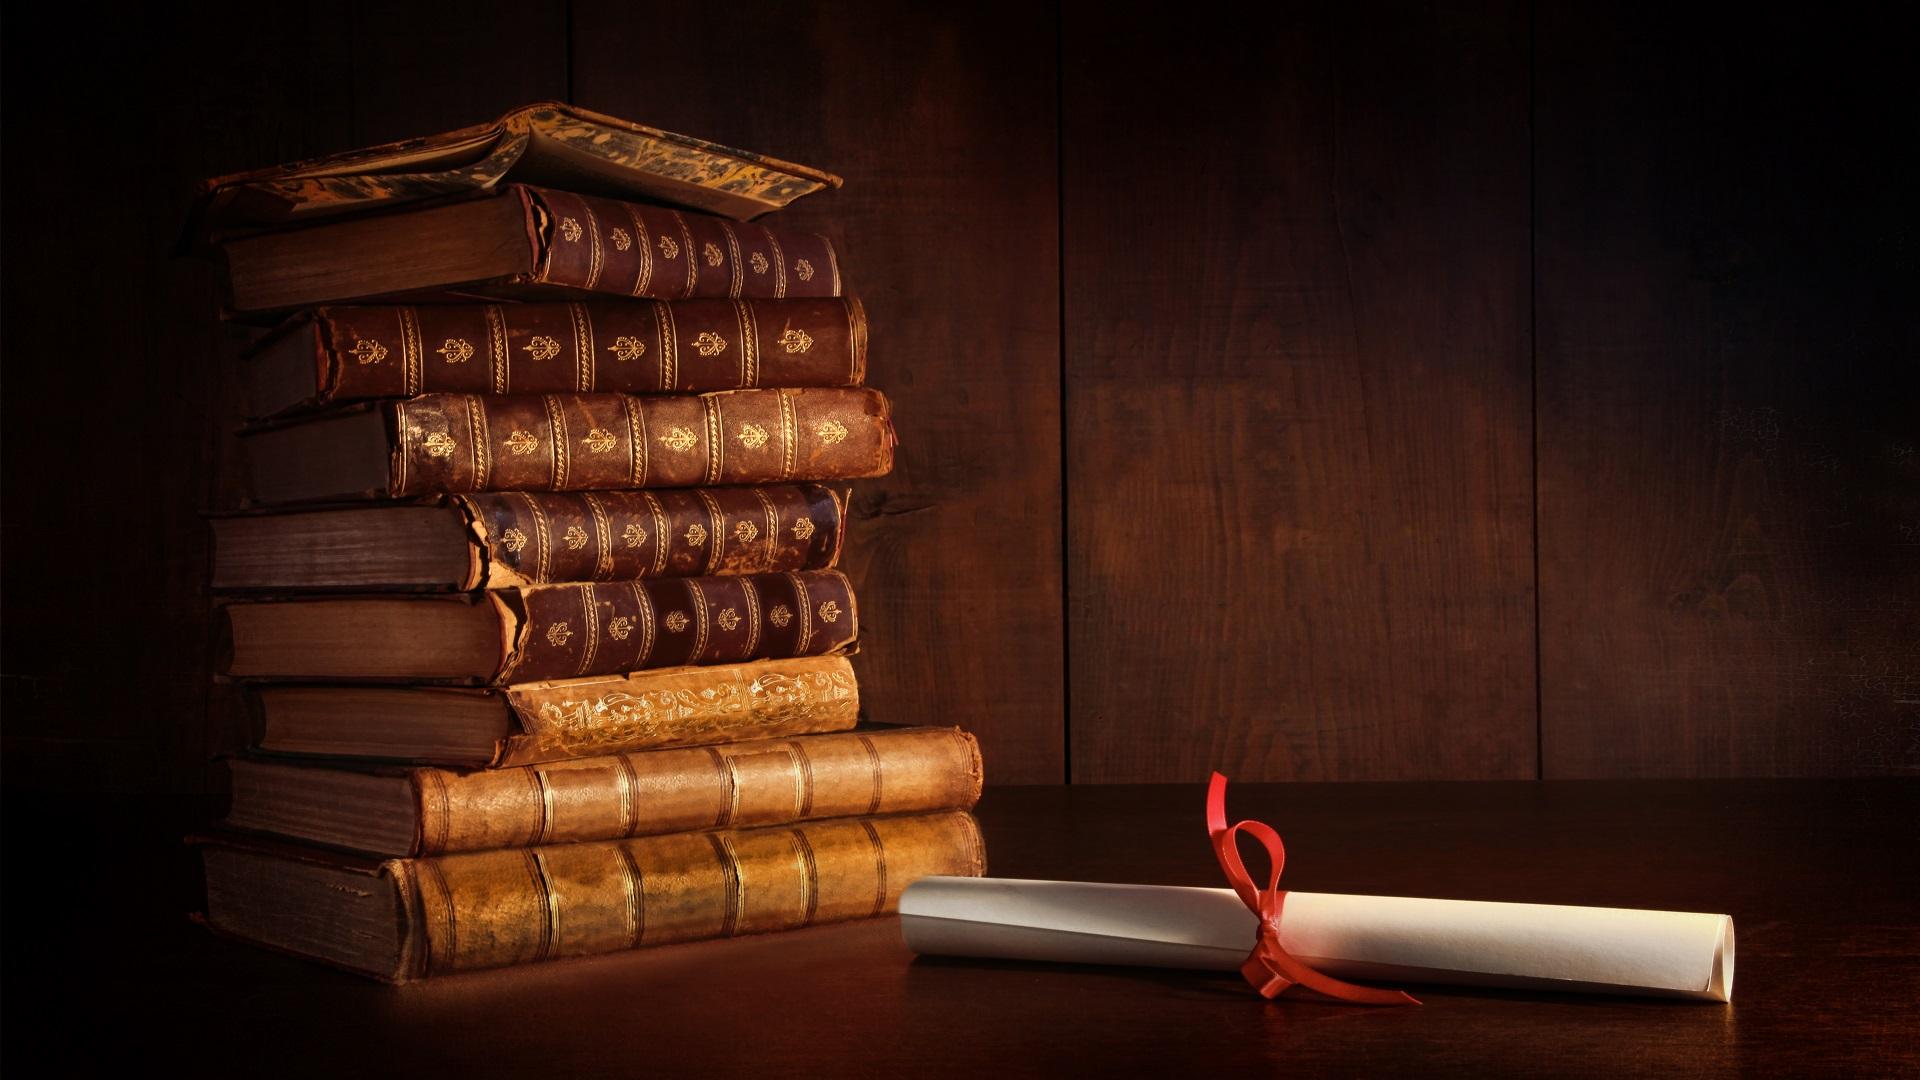 چاپ مقاله علمی پژوهشی | انجام مقاله علمی پژوهشی | مشاوره مقاله علمی و پژوهشی